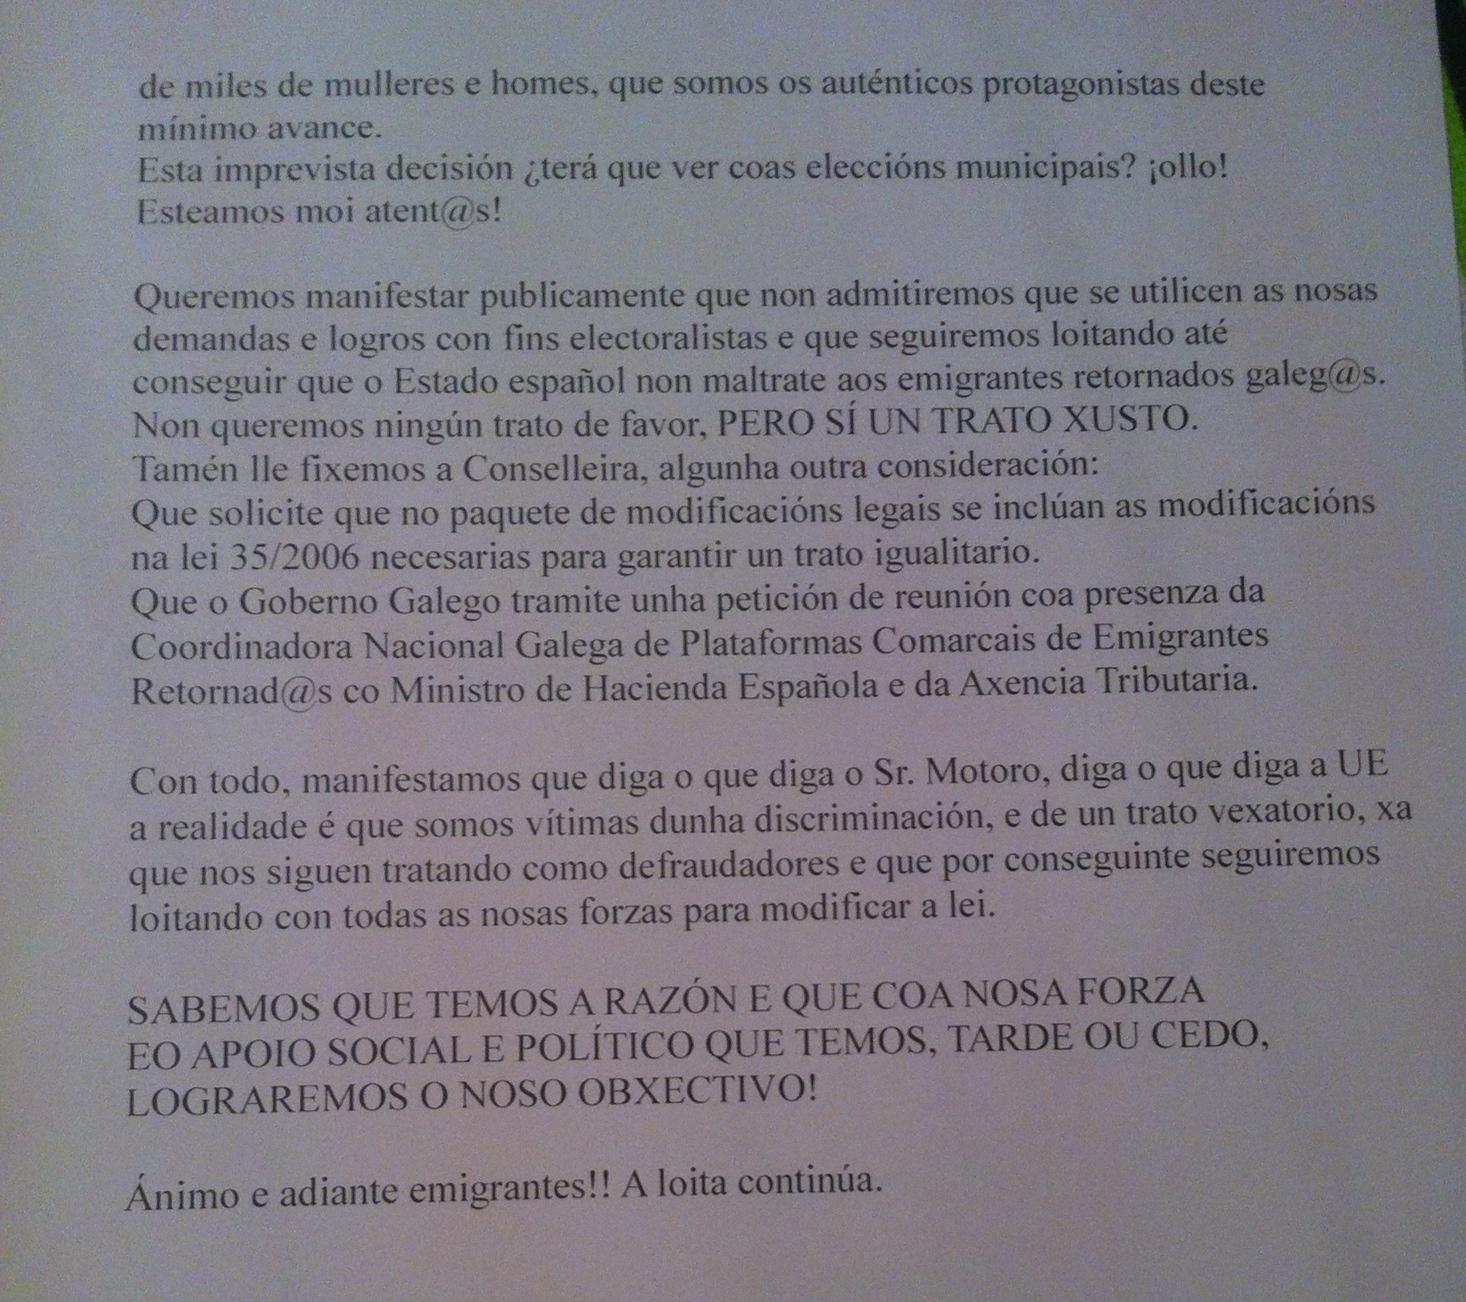 Manifesto 2/2 Colectivo emigrantes retornados